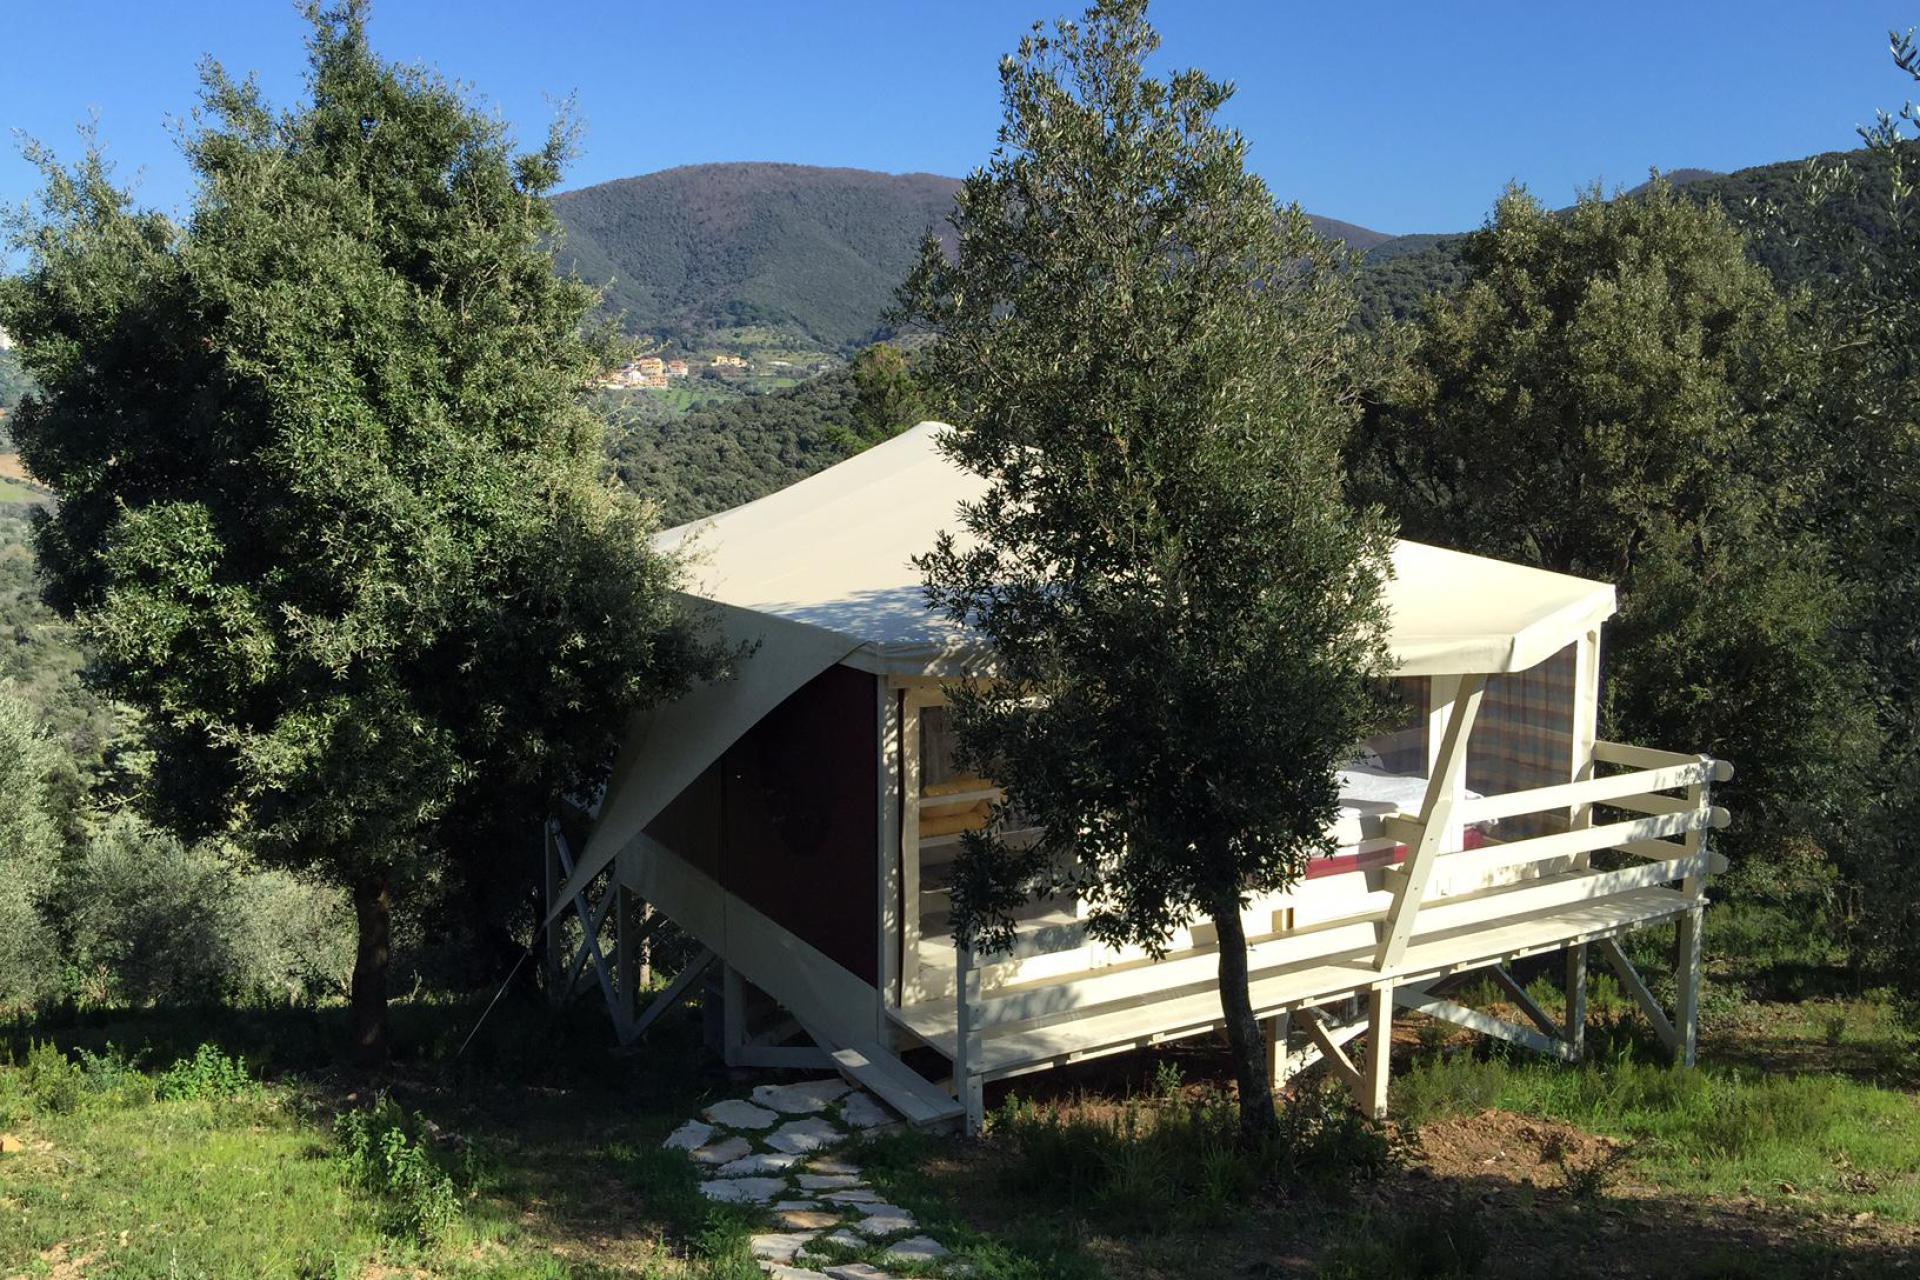 Agriturismo Toscana Splendida country house in Toscana con vista mare